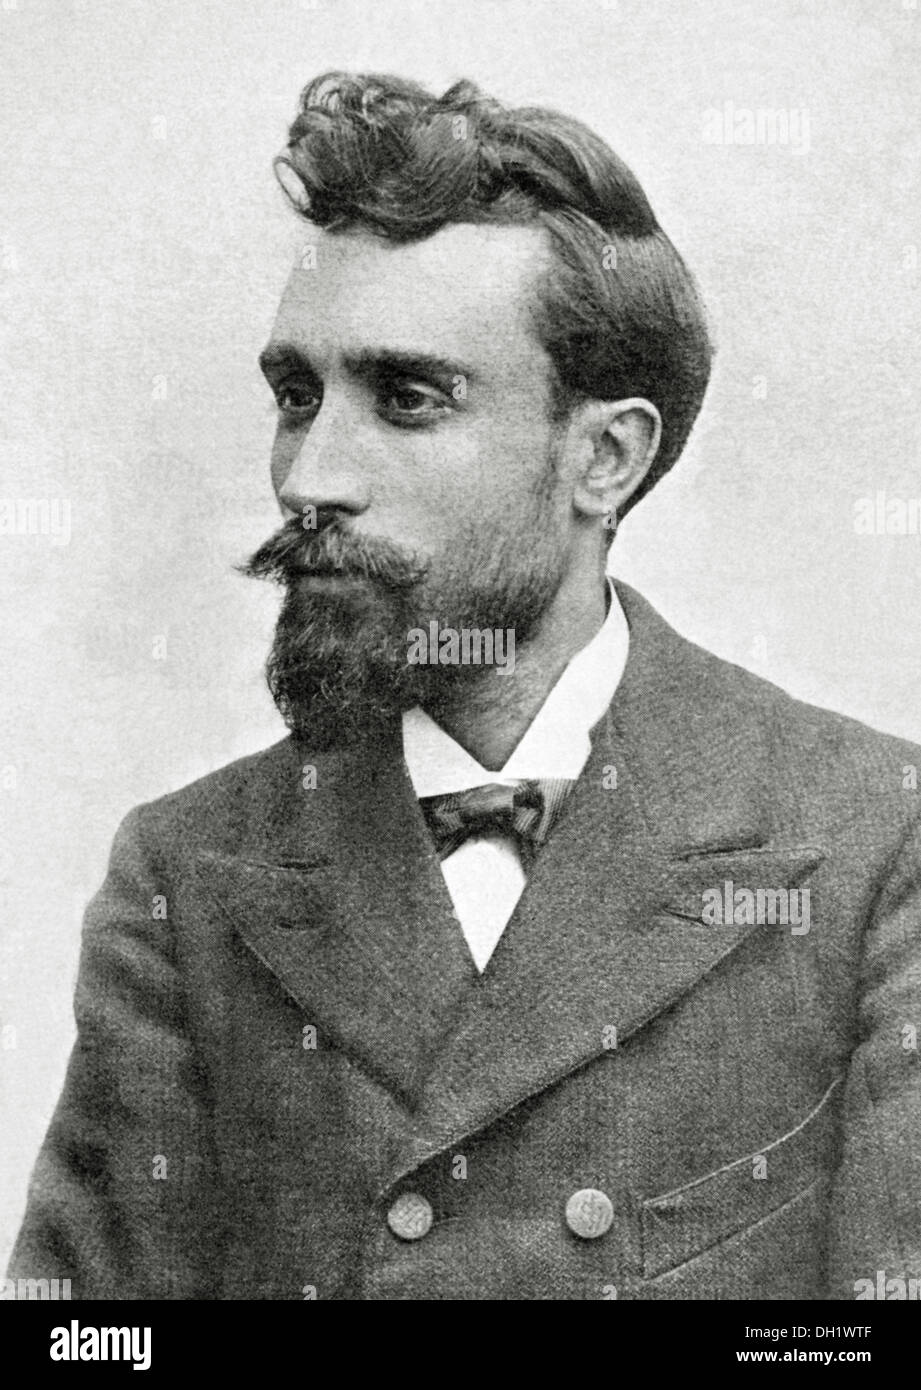 Ignasi Iglesias Pujadas (1871-1928). Spanish playwright and poet. The Catalan Illustration, 1904. - Stock Image